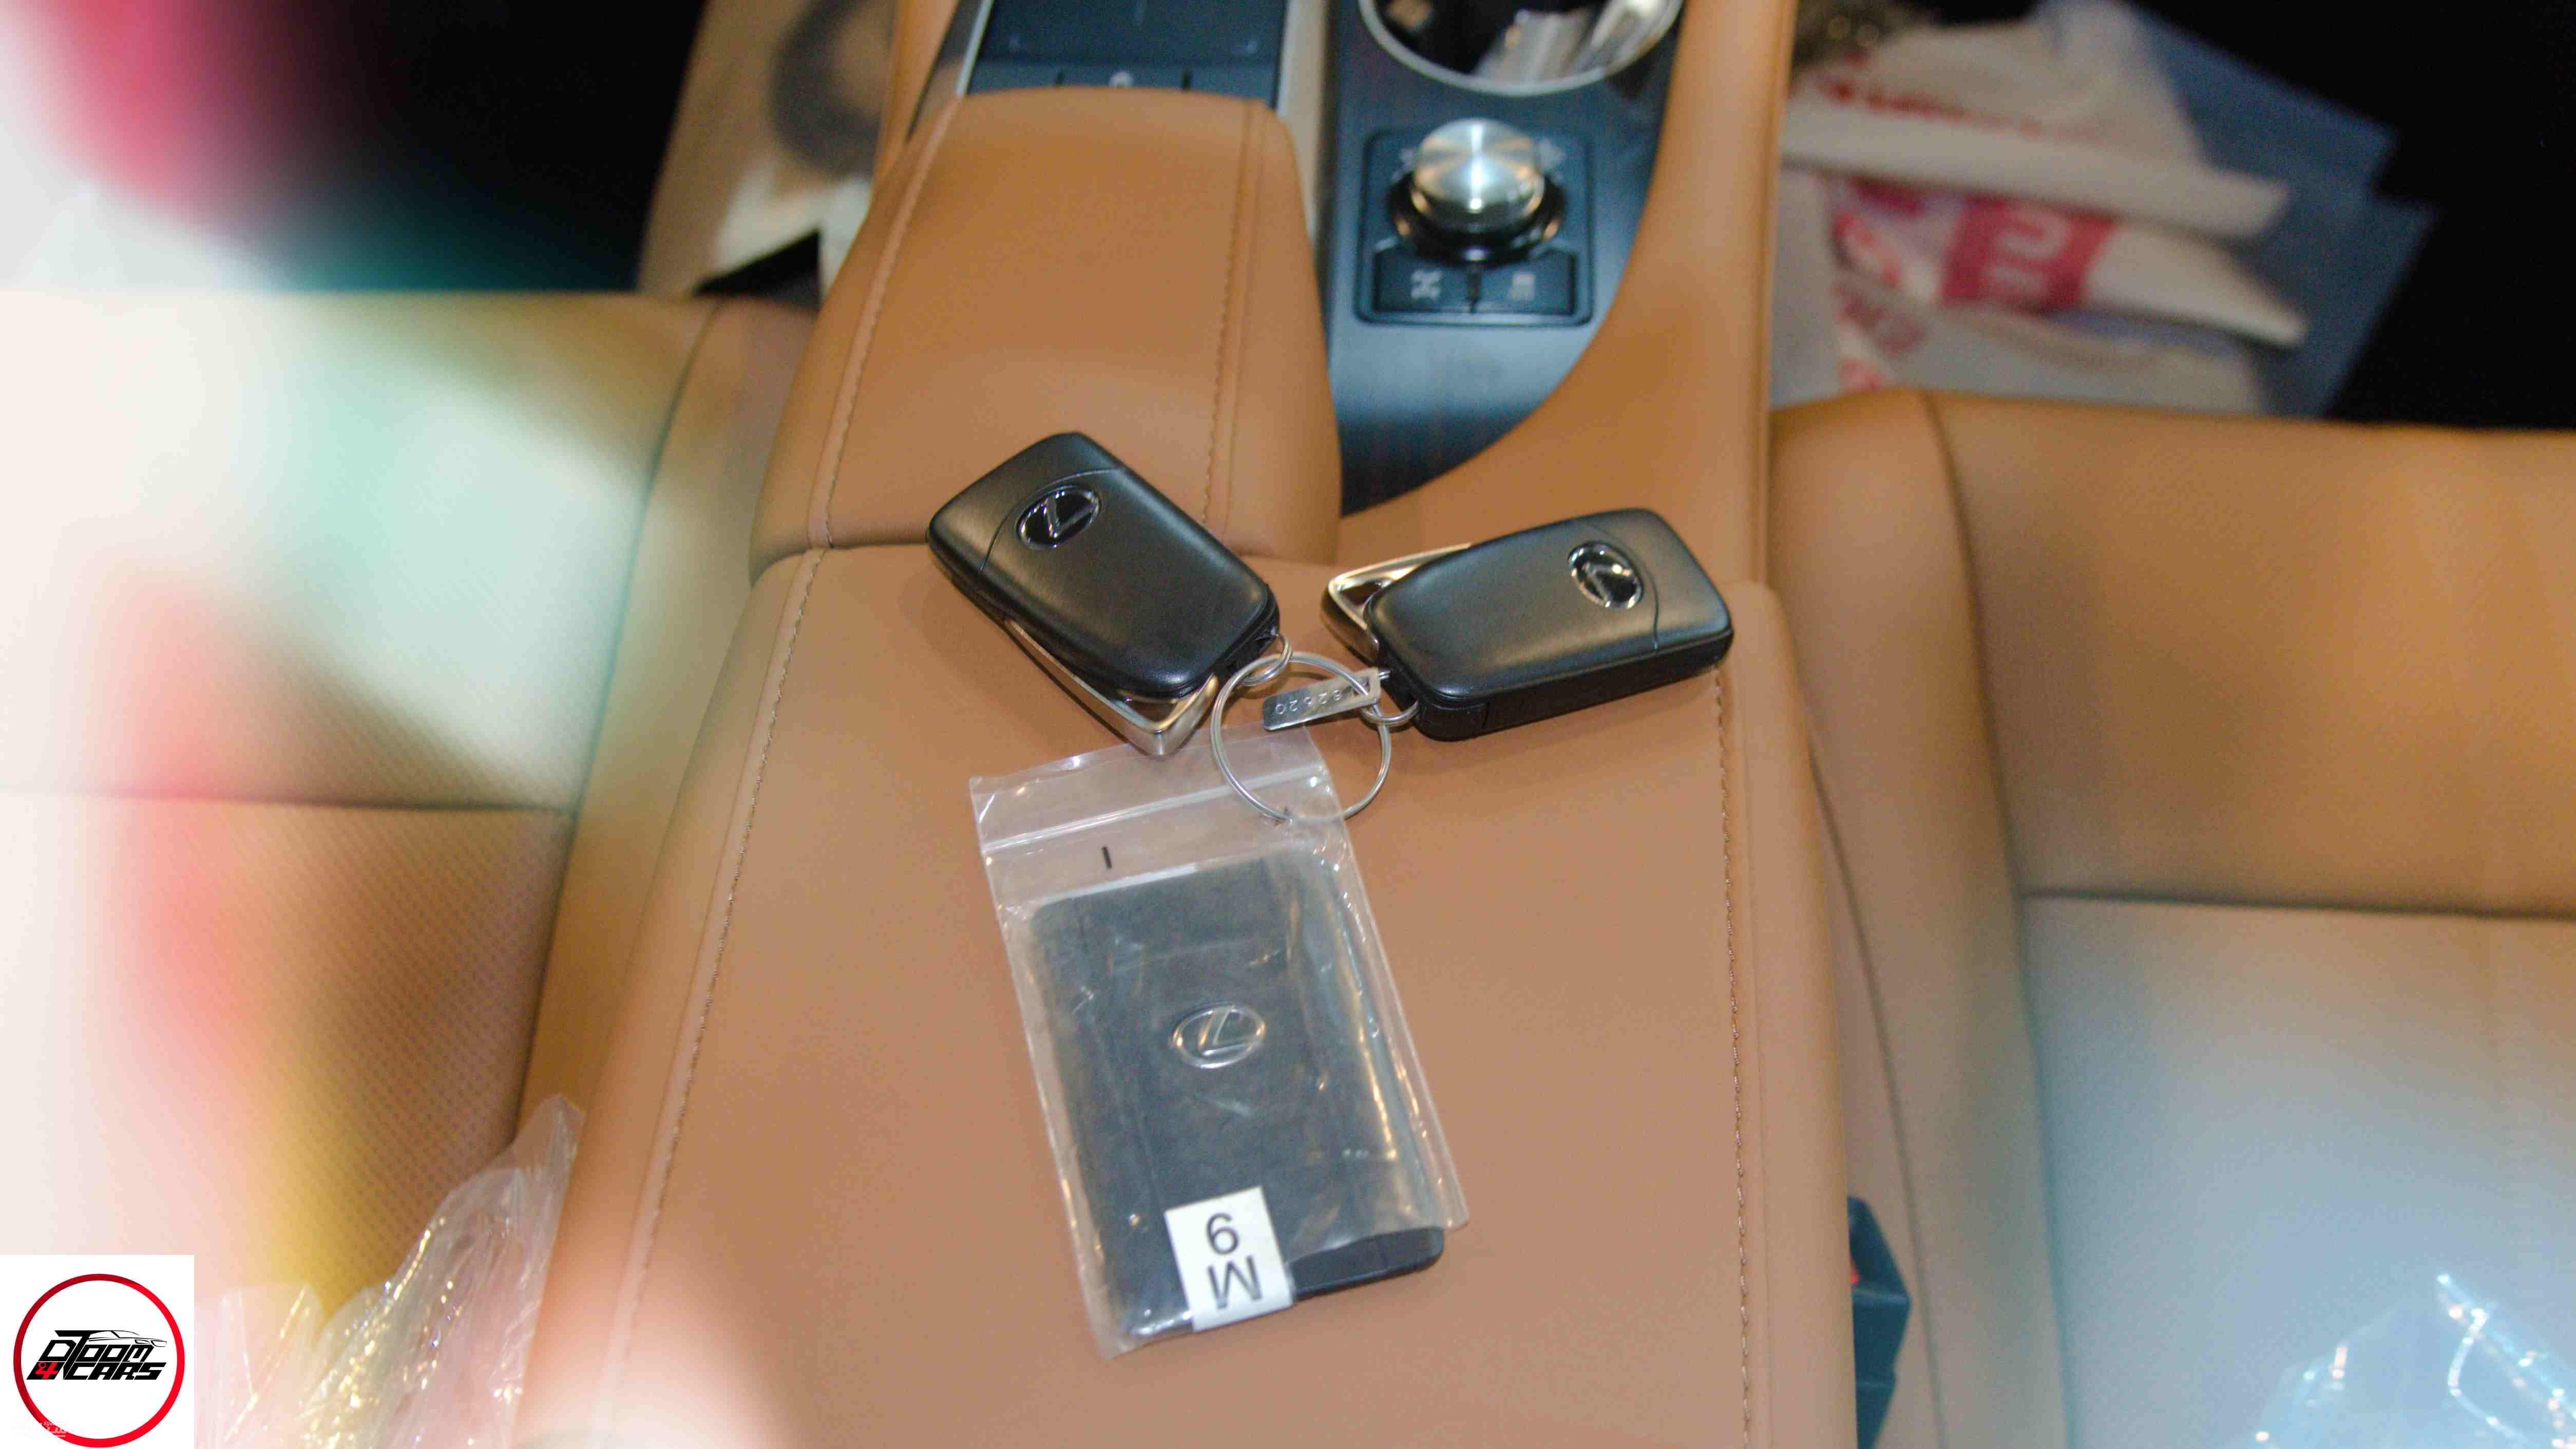 لكزس RX 350 BB سعودي 2021